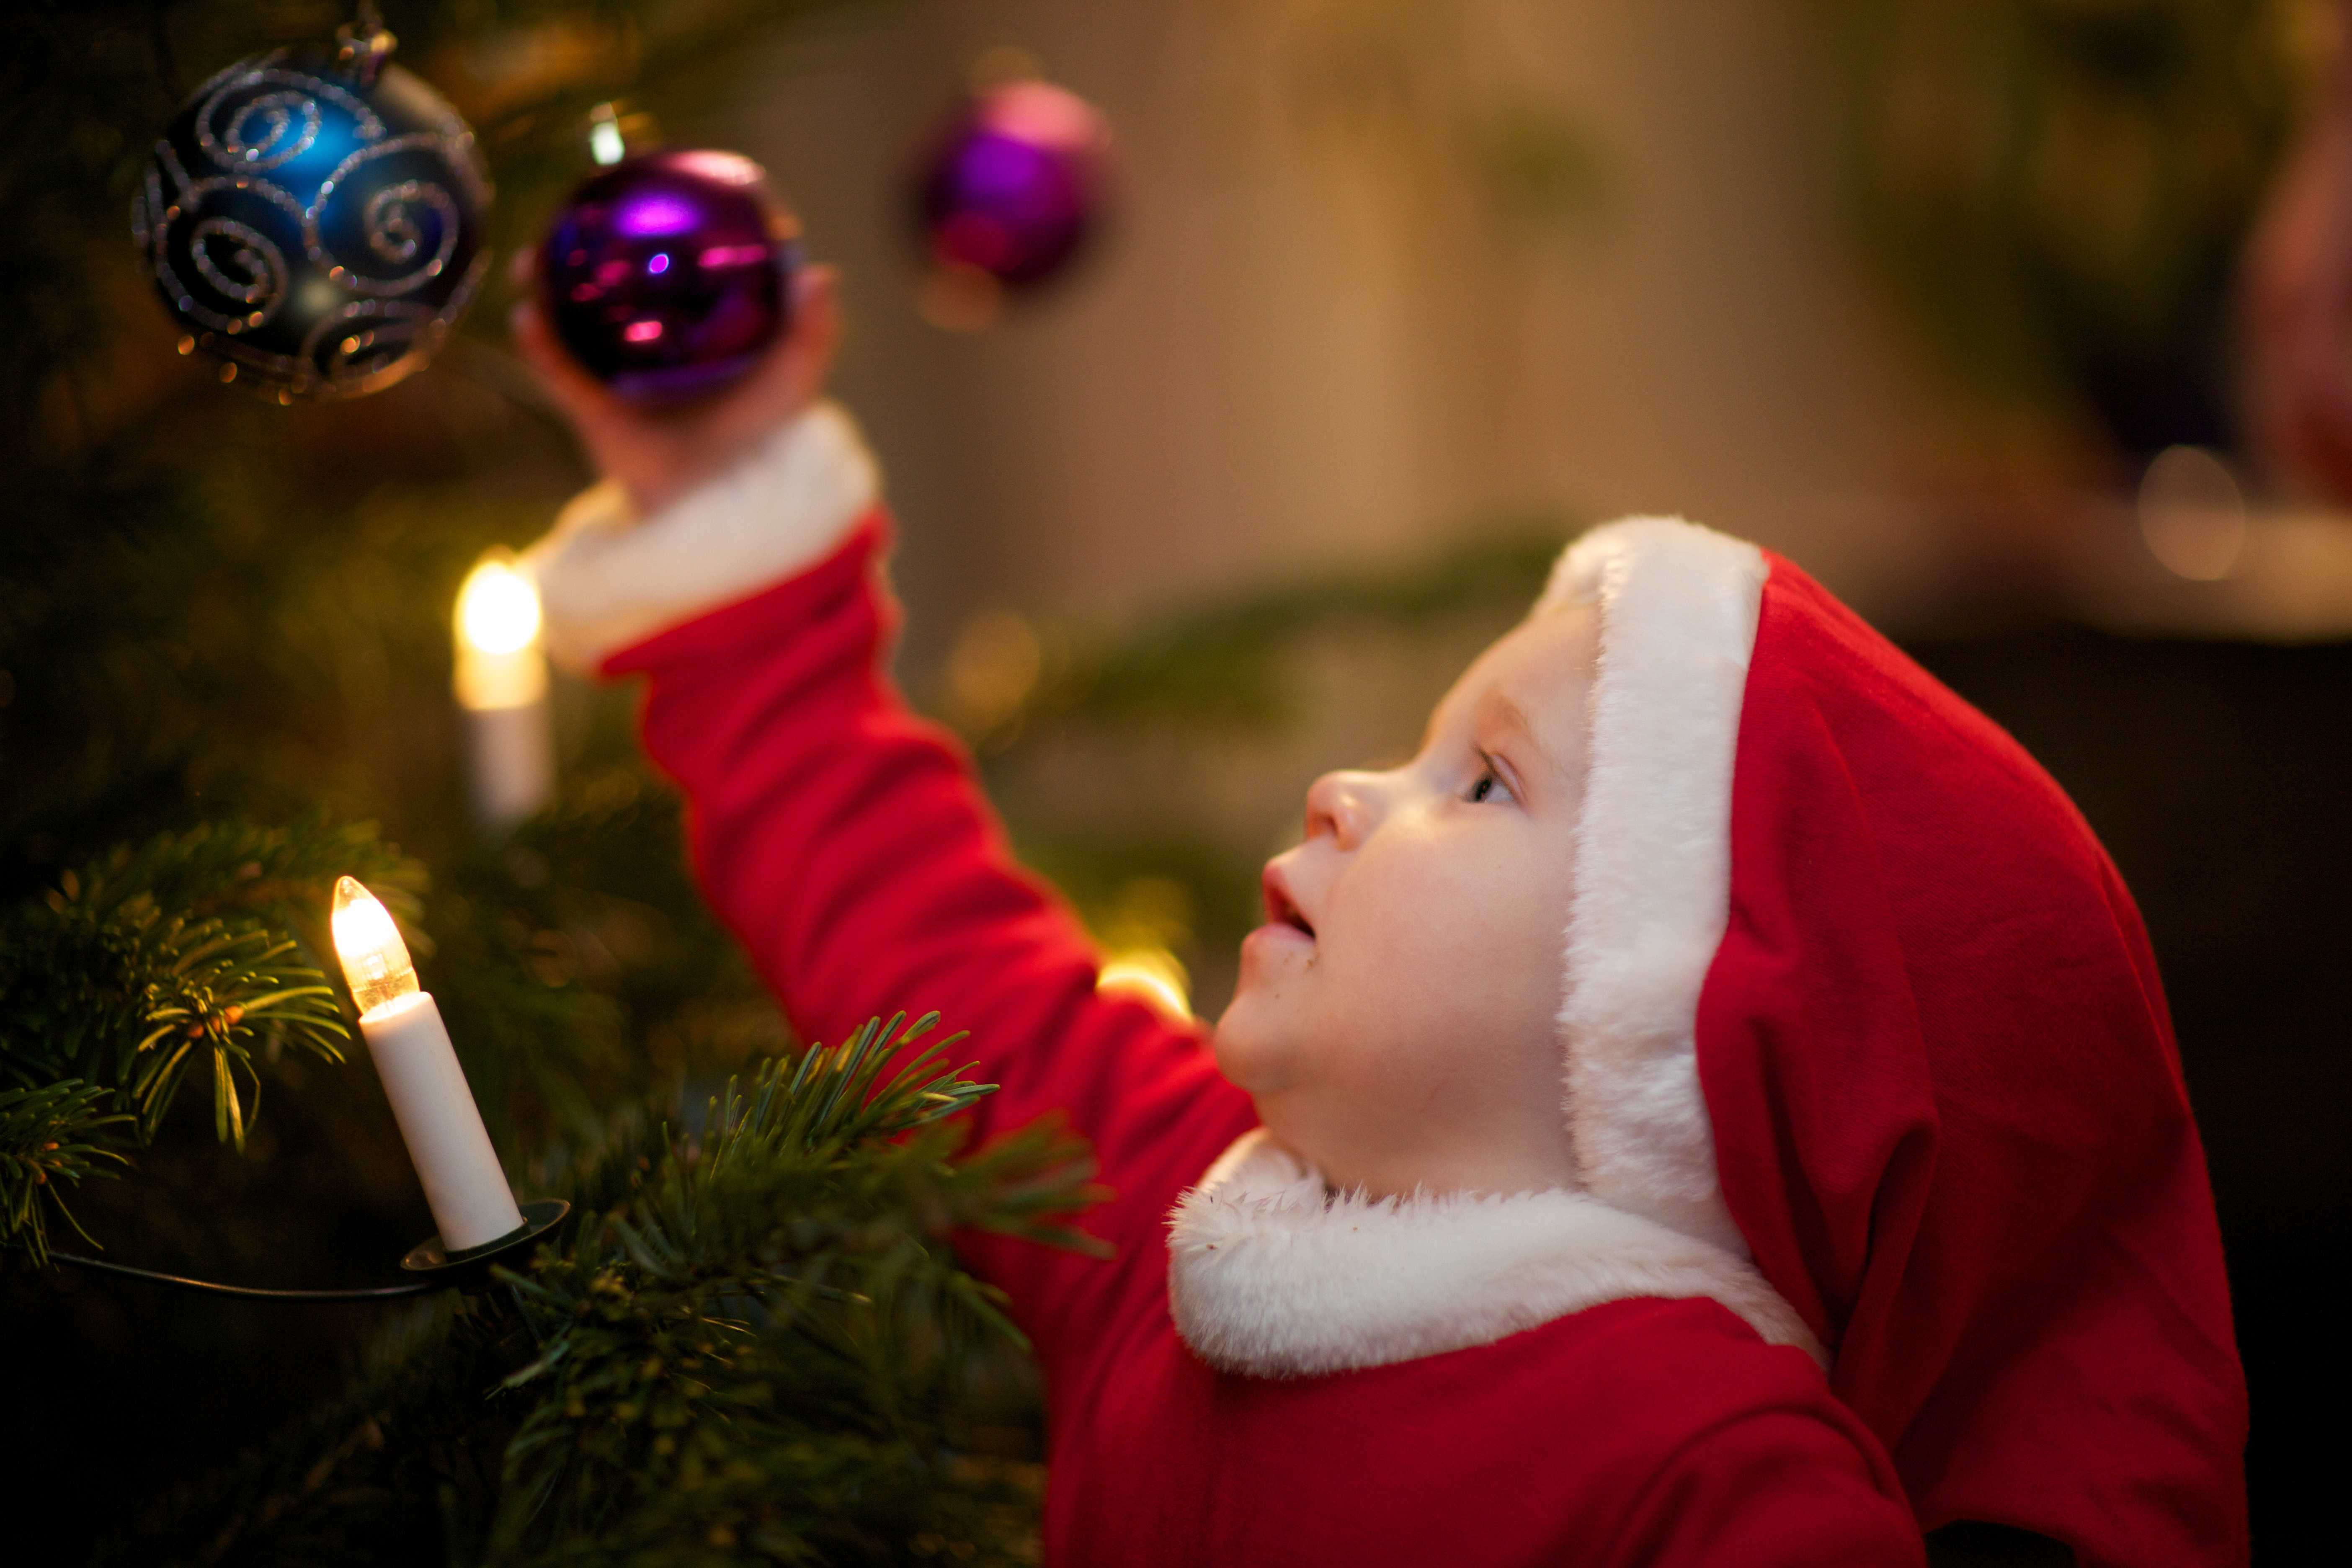 Decorating_the_Christmas_tree